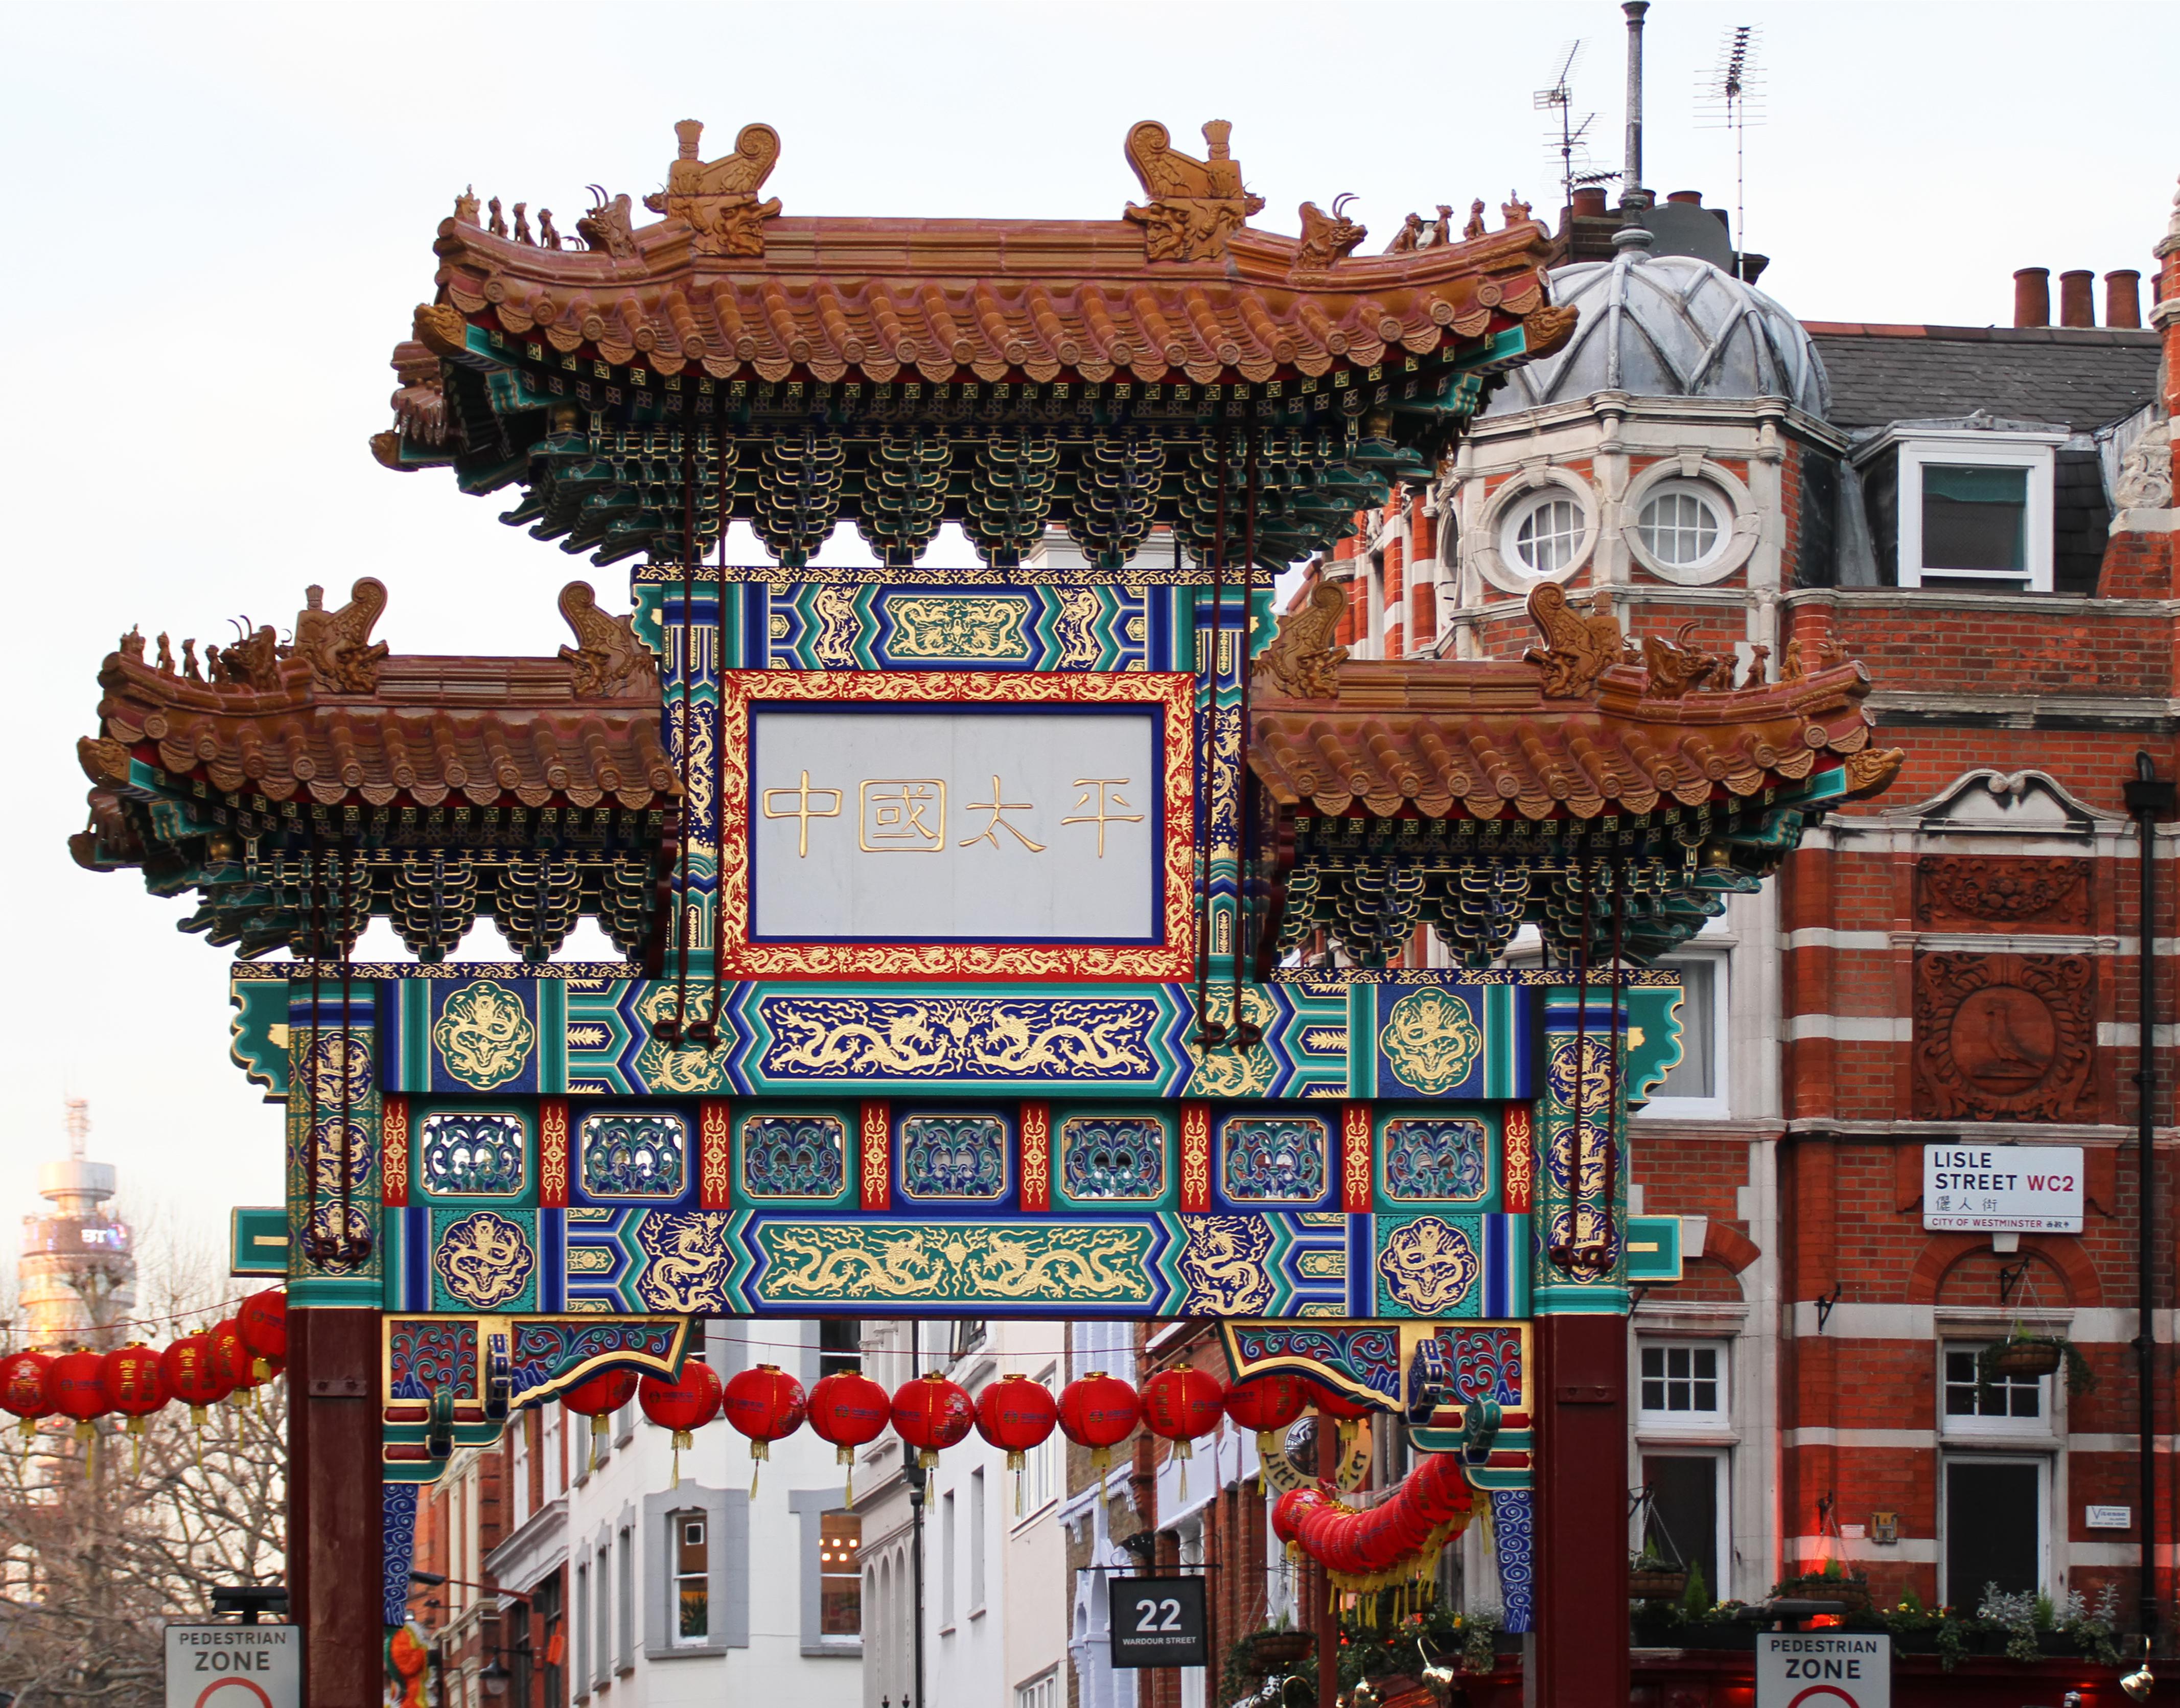 Groovy Chinatown London Wikipedia Download Free Architecture Designs Photstoregrimeyleaguecom